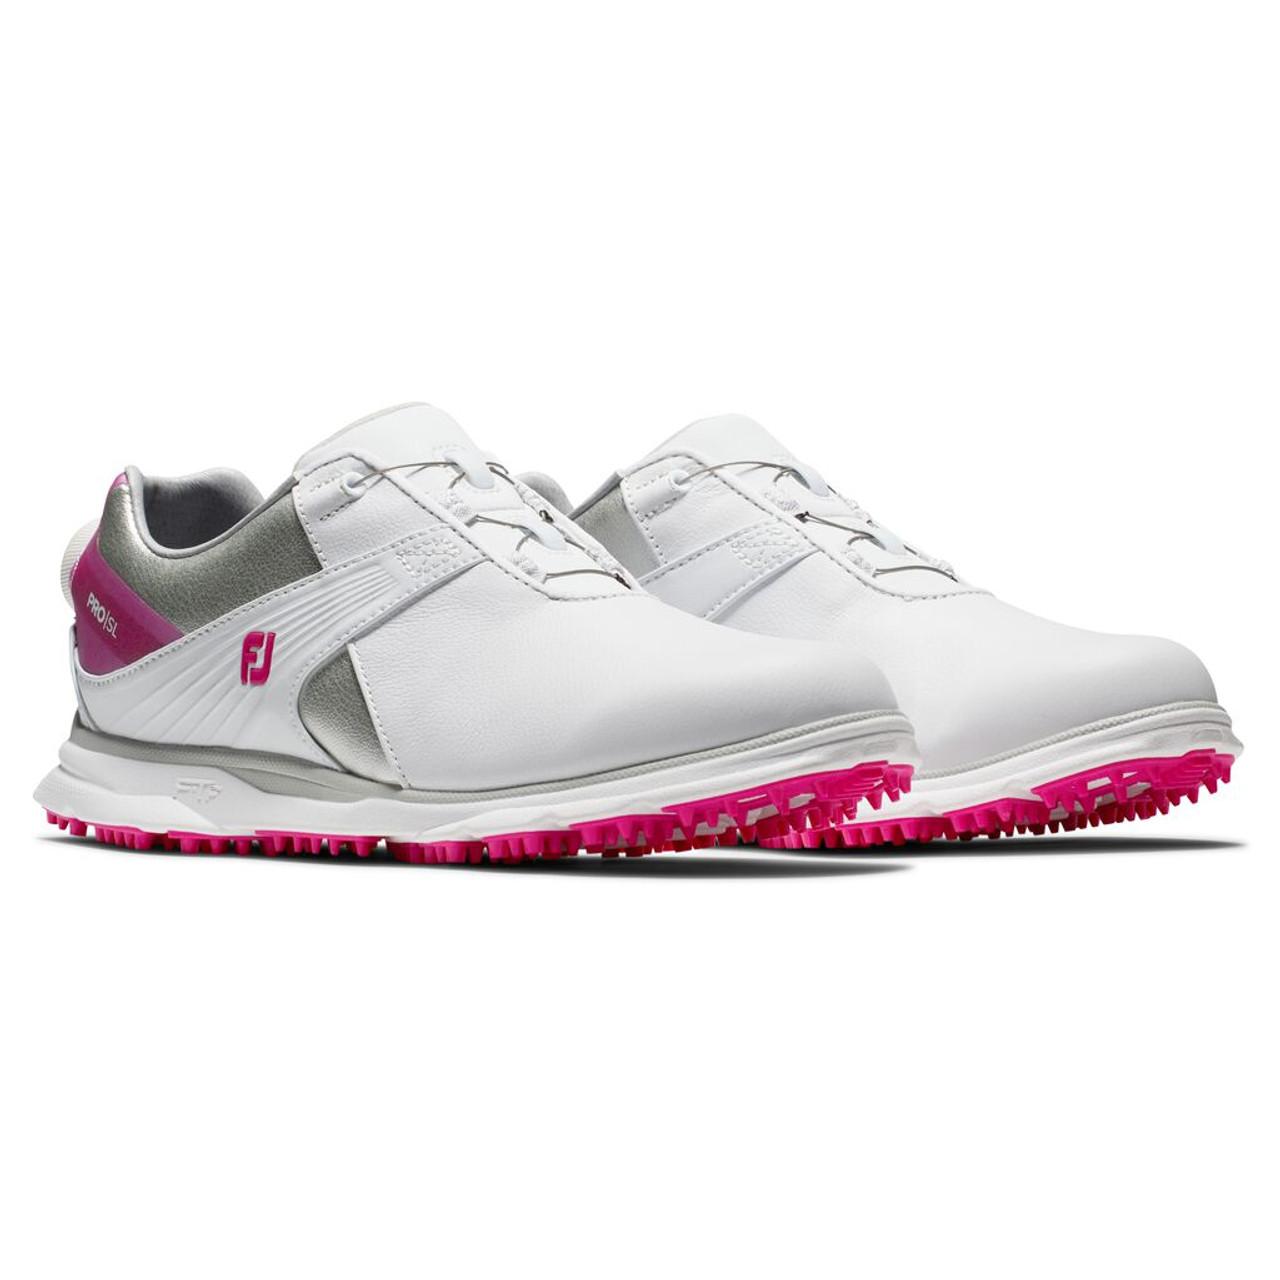 FootJoy Pro SL Womens BOA Golf Shoes - White / Silver / Rose (98119)